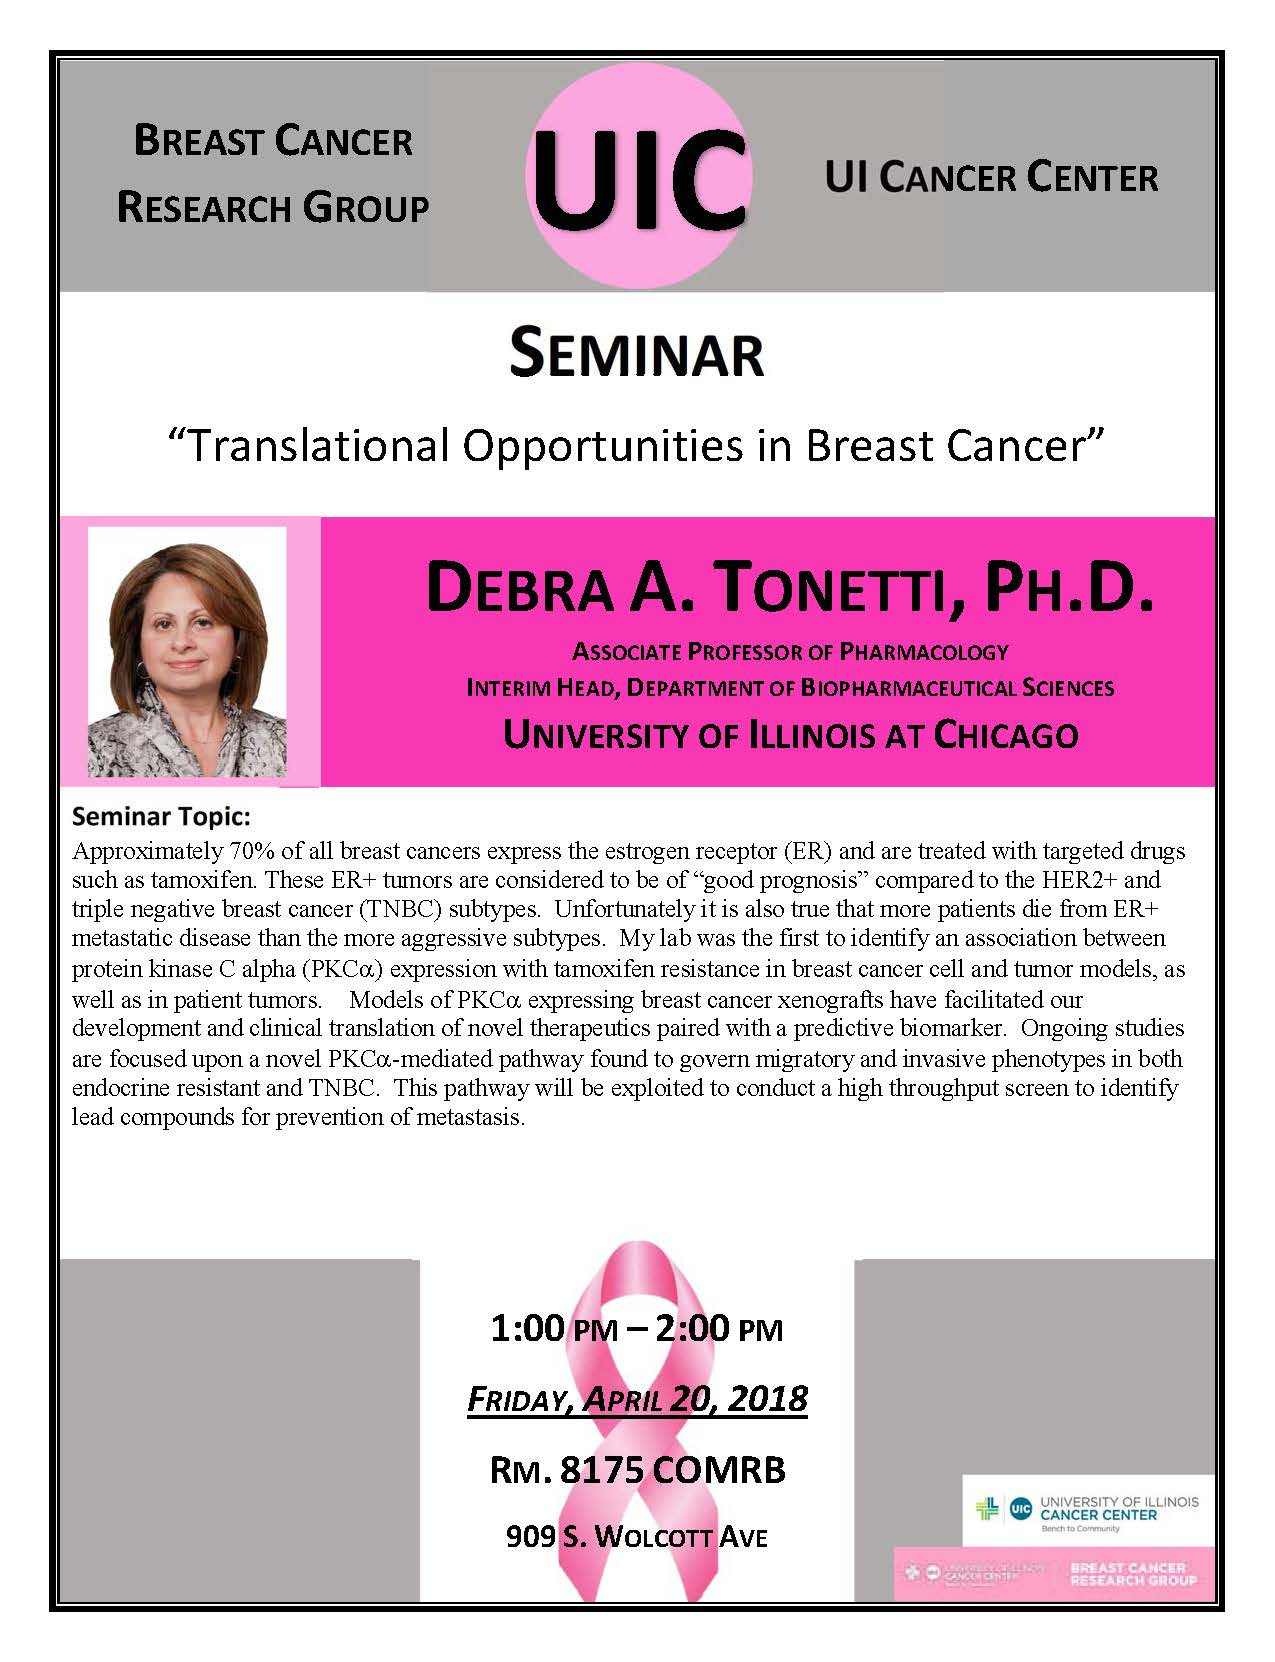 BCRG Seminar Flyer_Tonetti.jpg